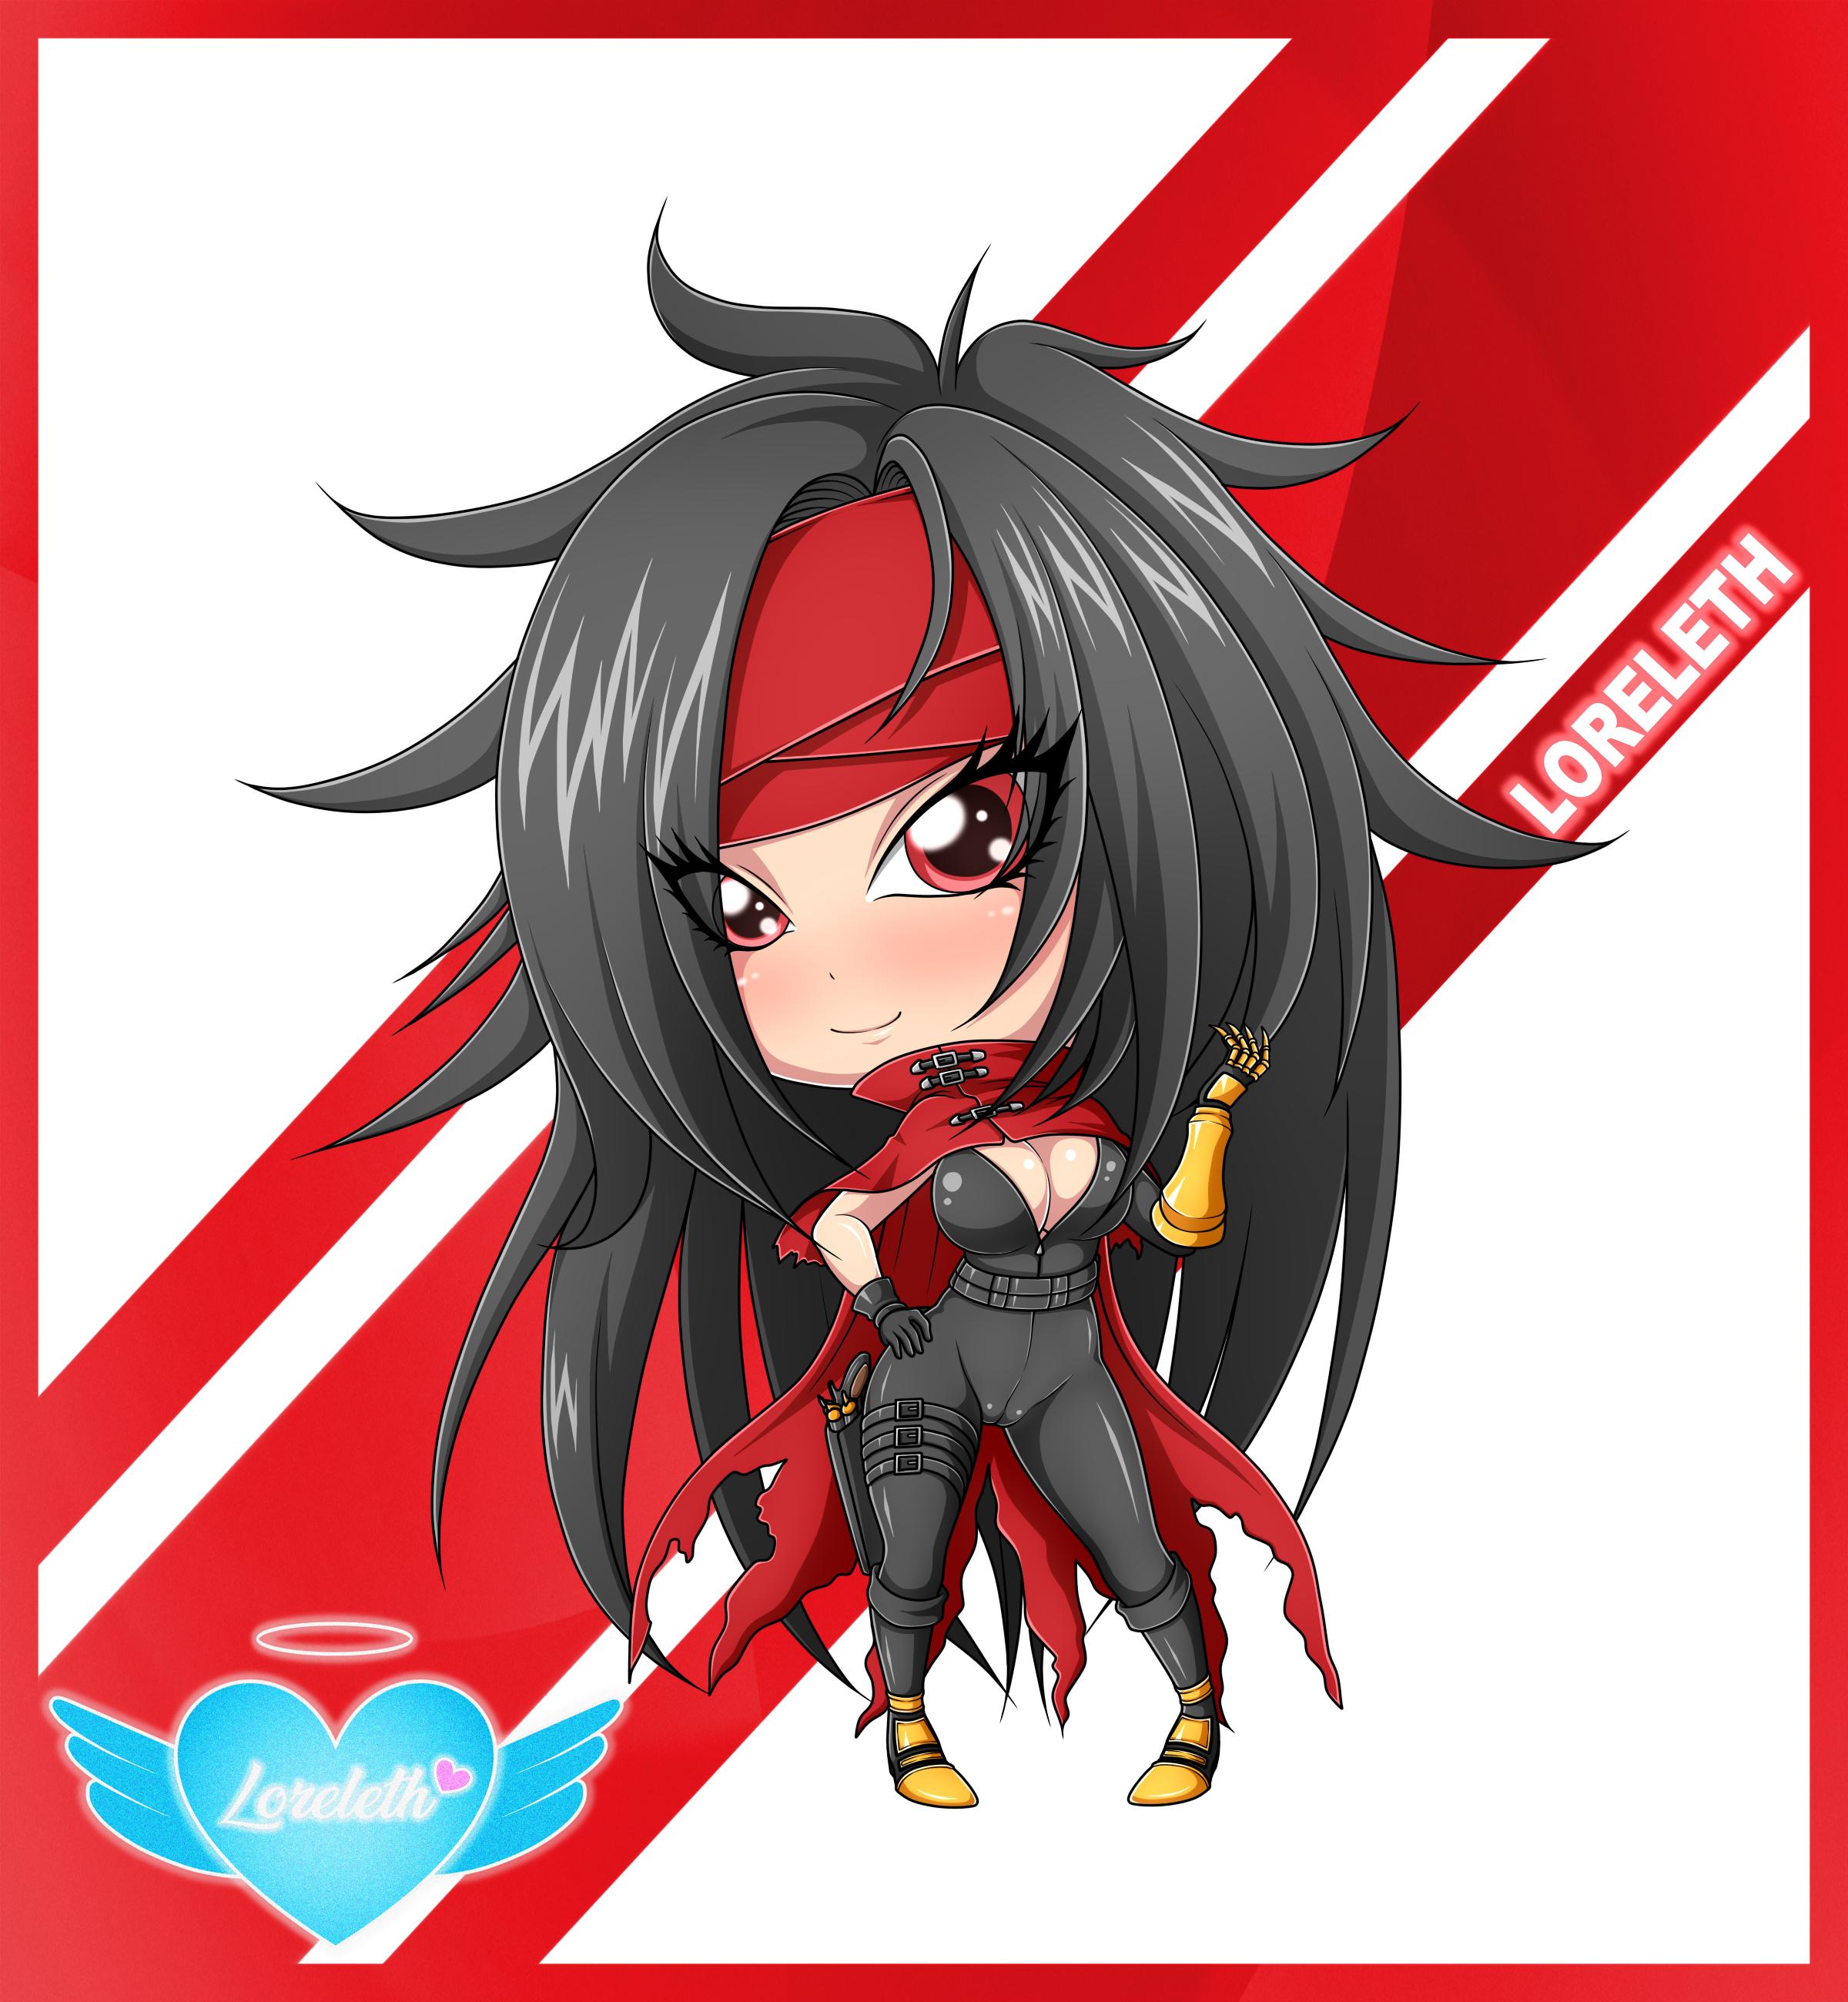 Cute Chibi Girl 43 (Commission)